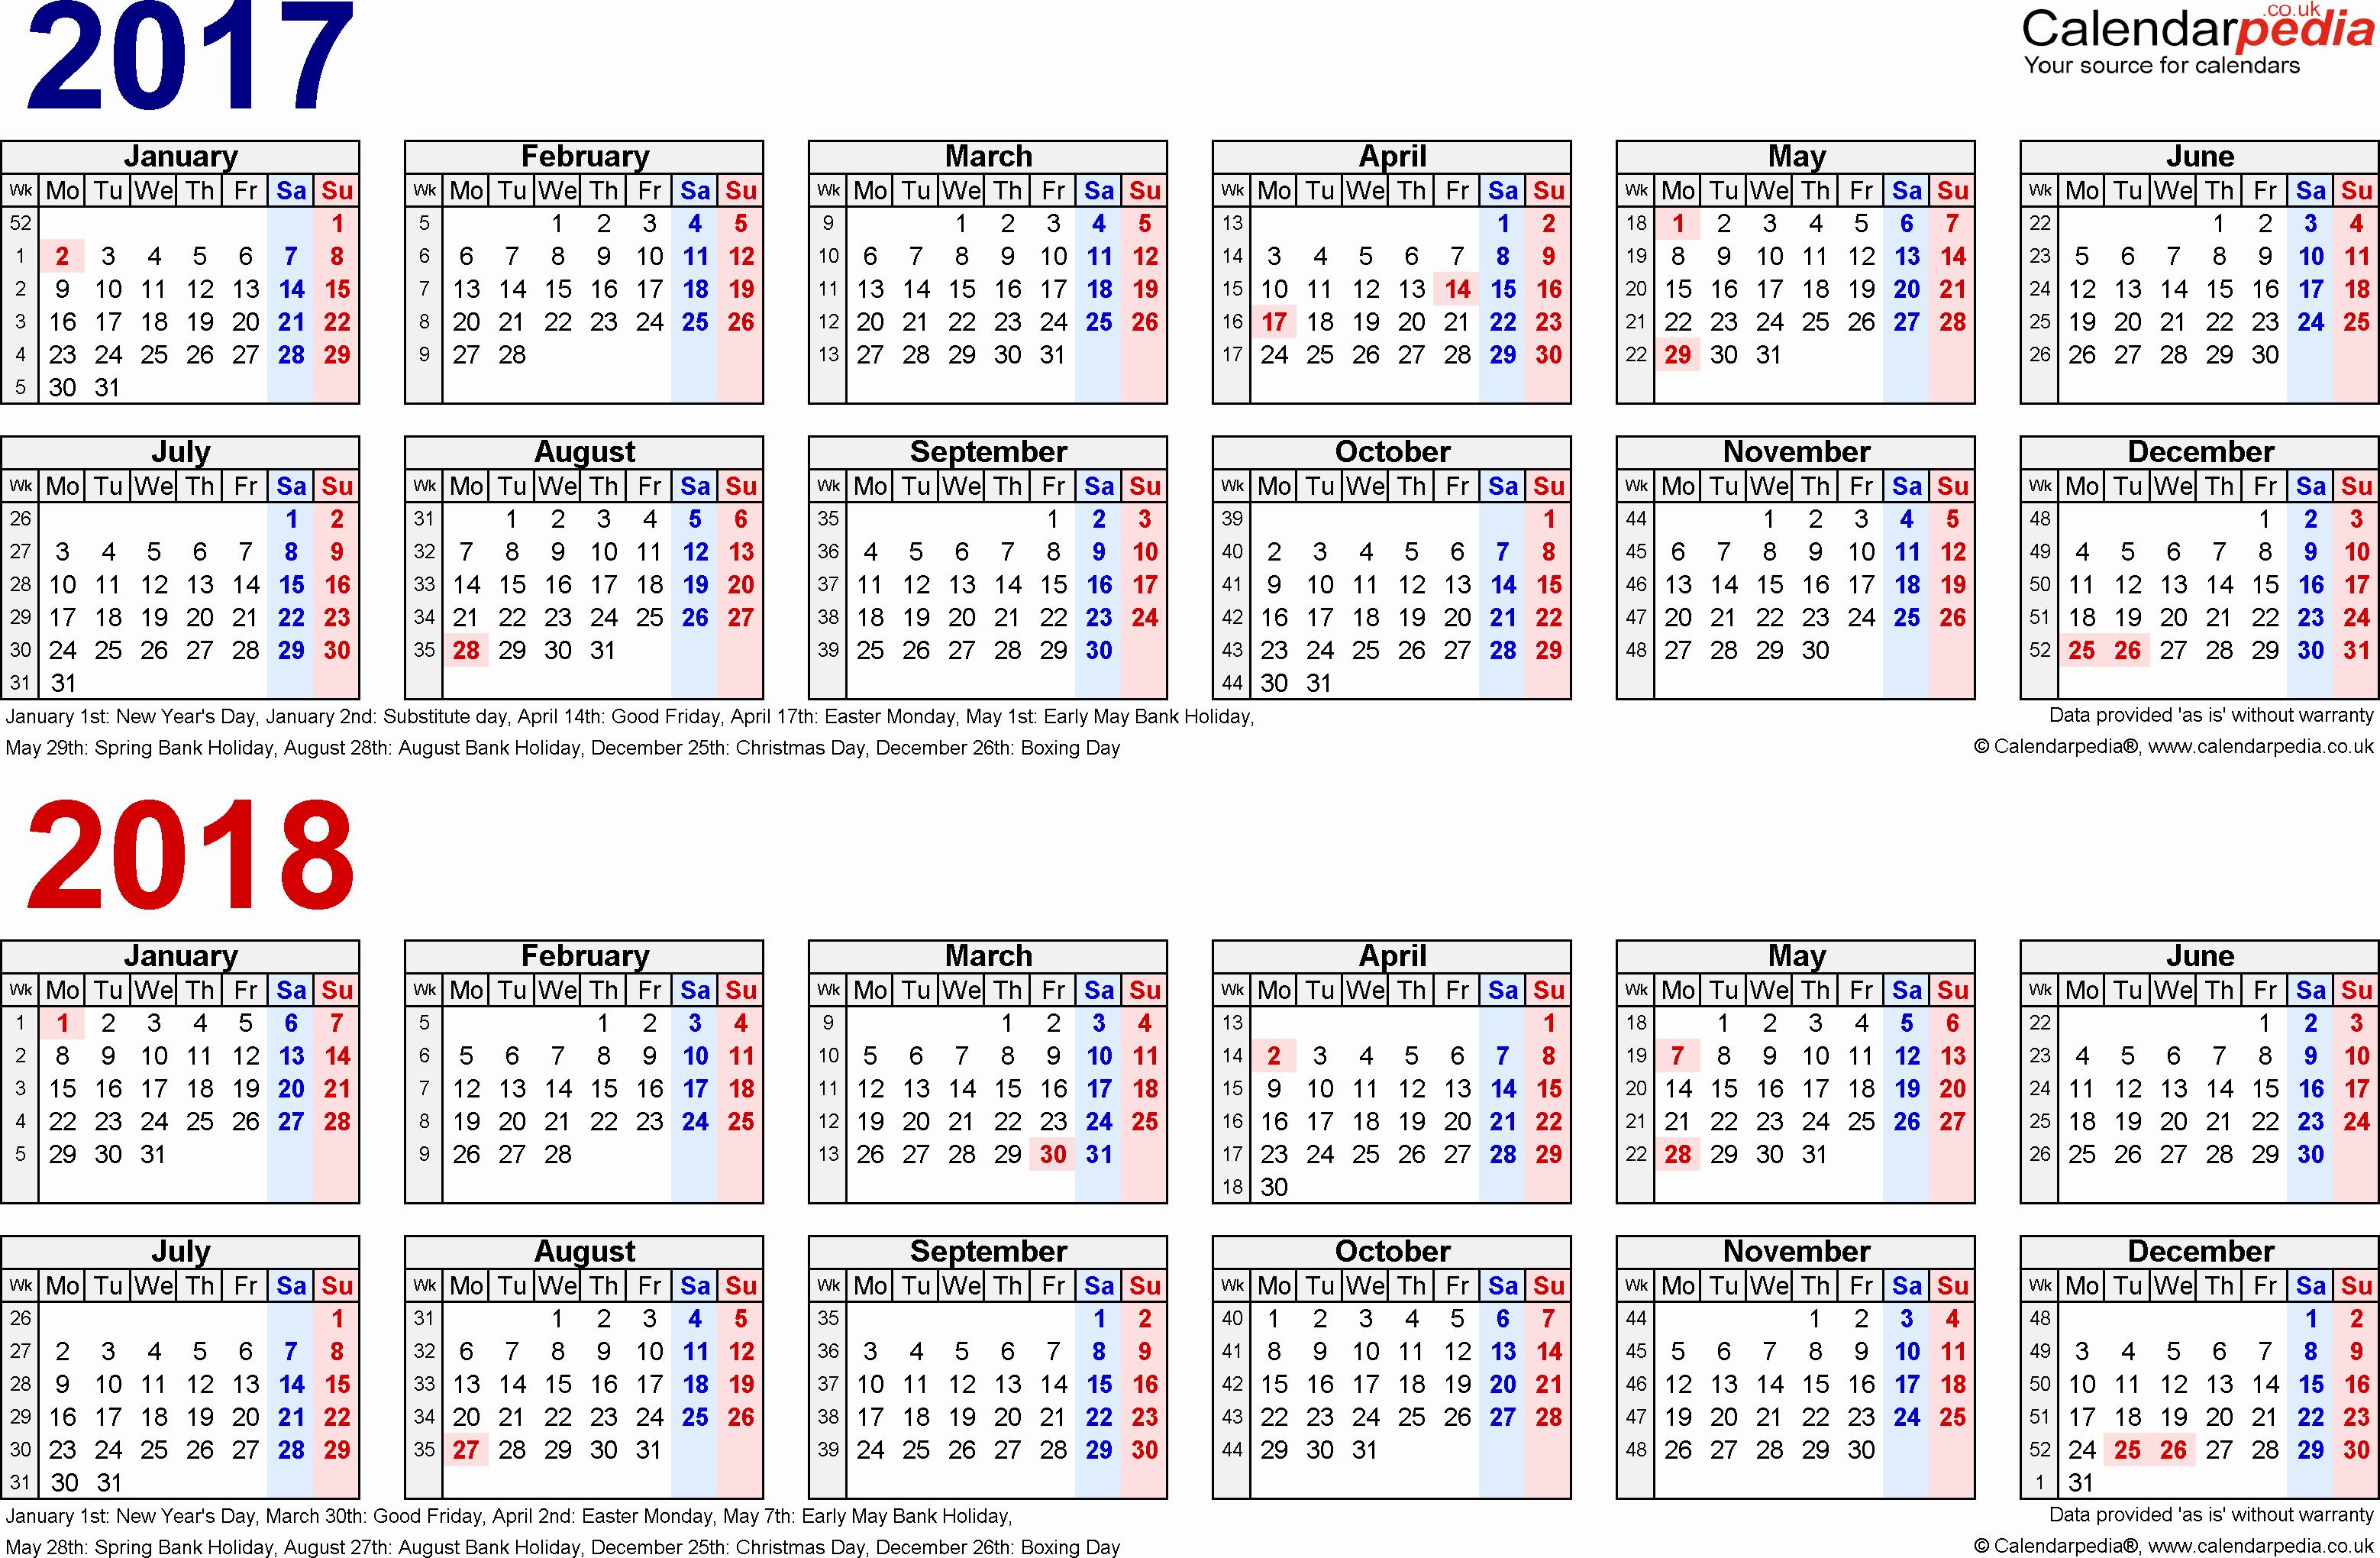 2018 Month by Month Calendar Fresh Weekly Calendar 2018